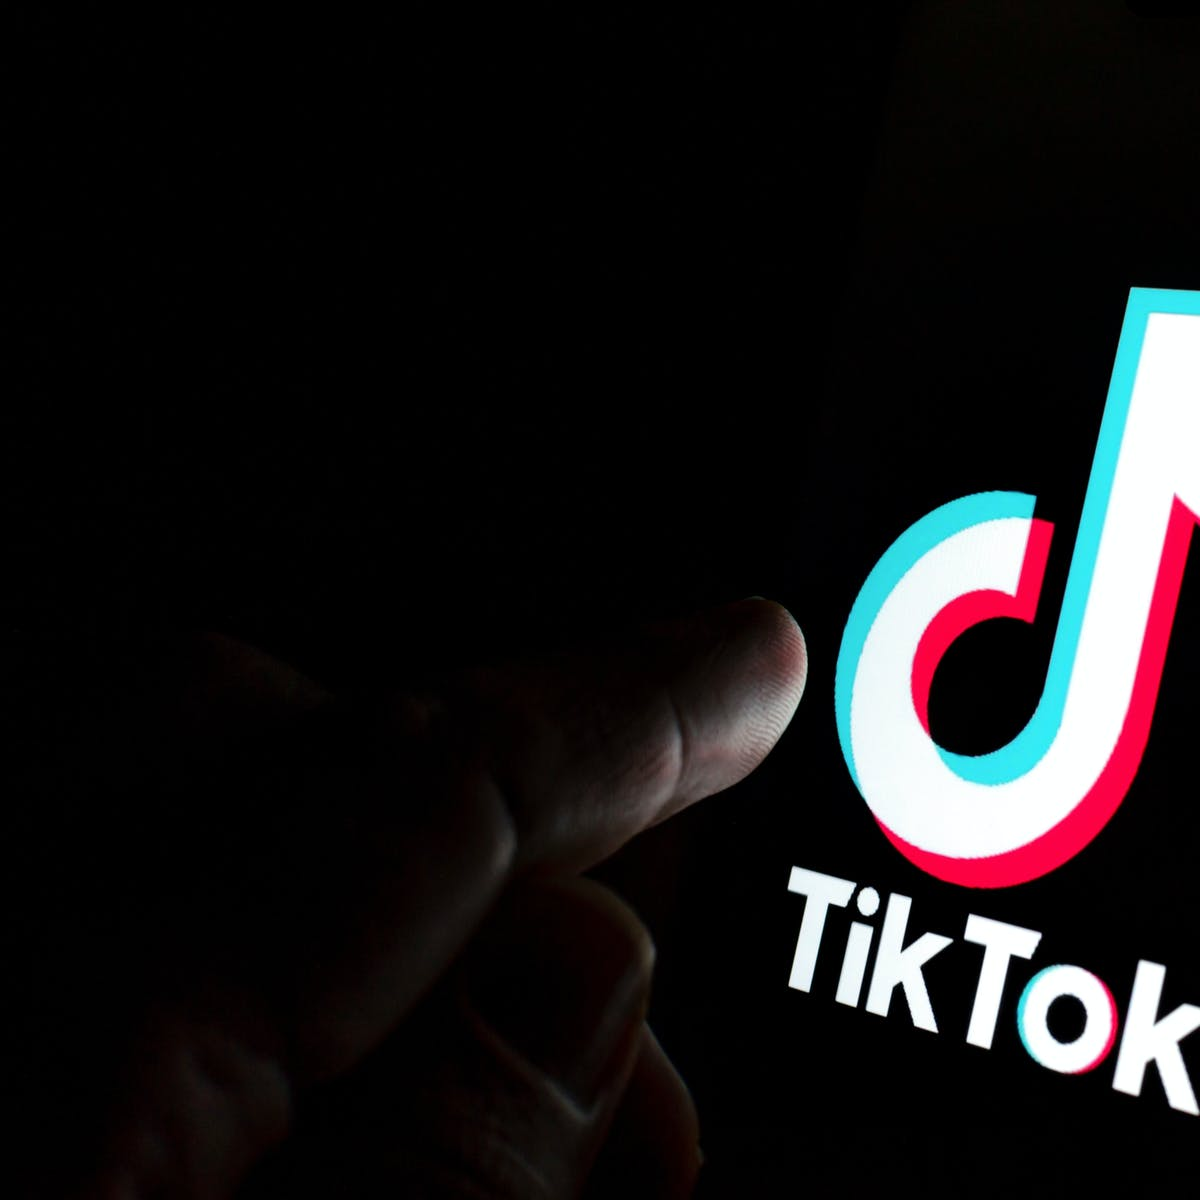 Analizamos TikTok: ¿es seguro utilizarla?